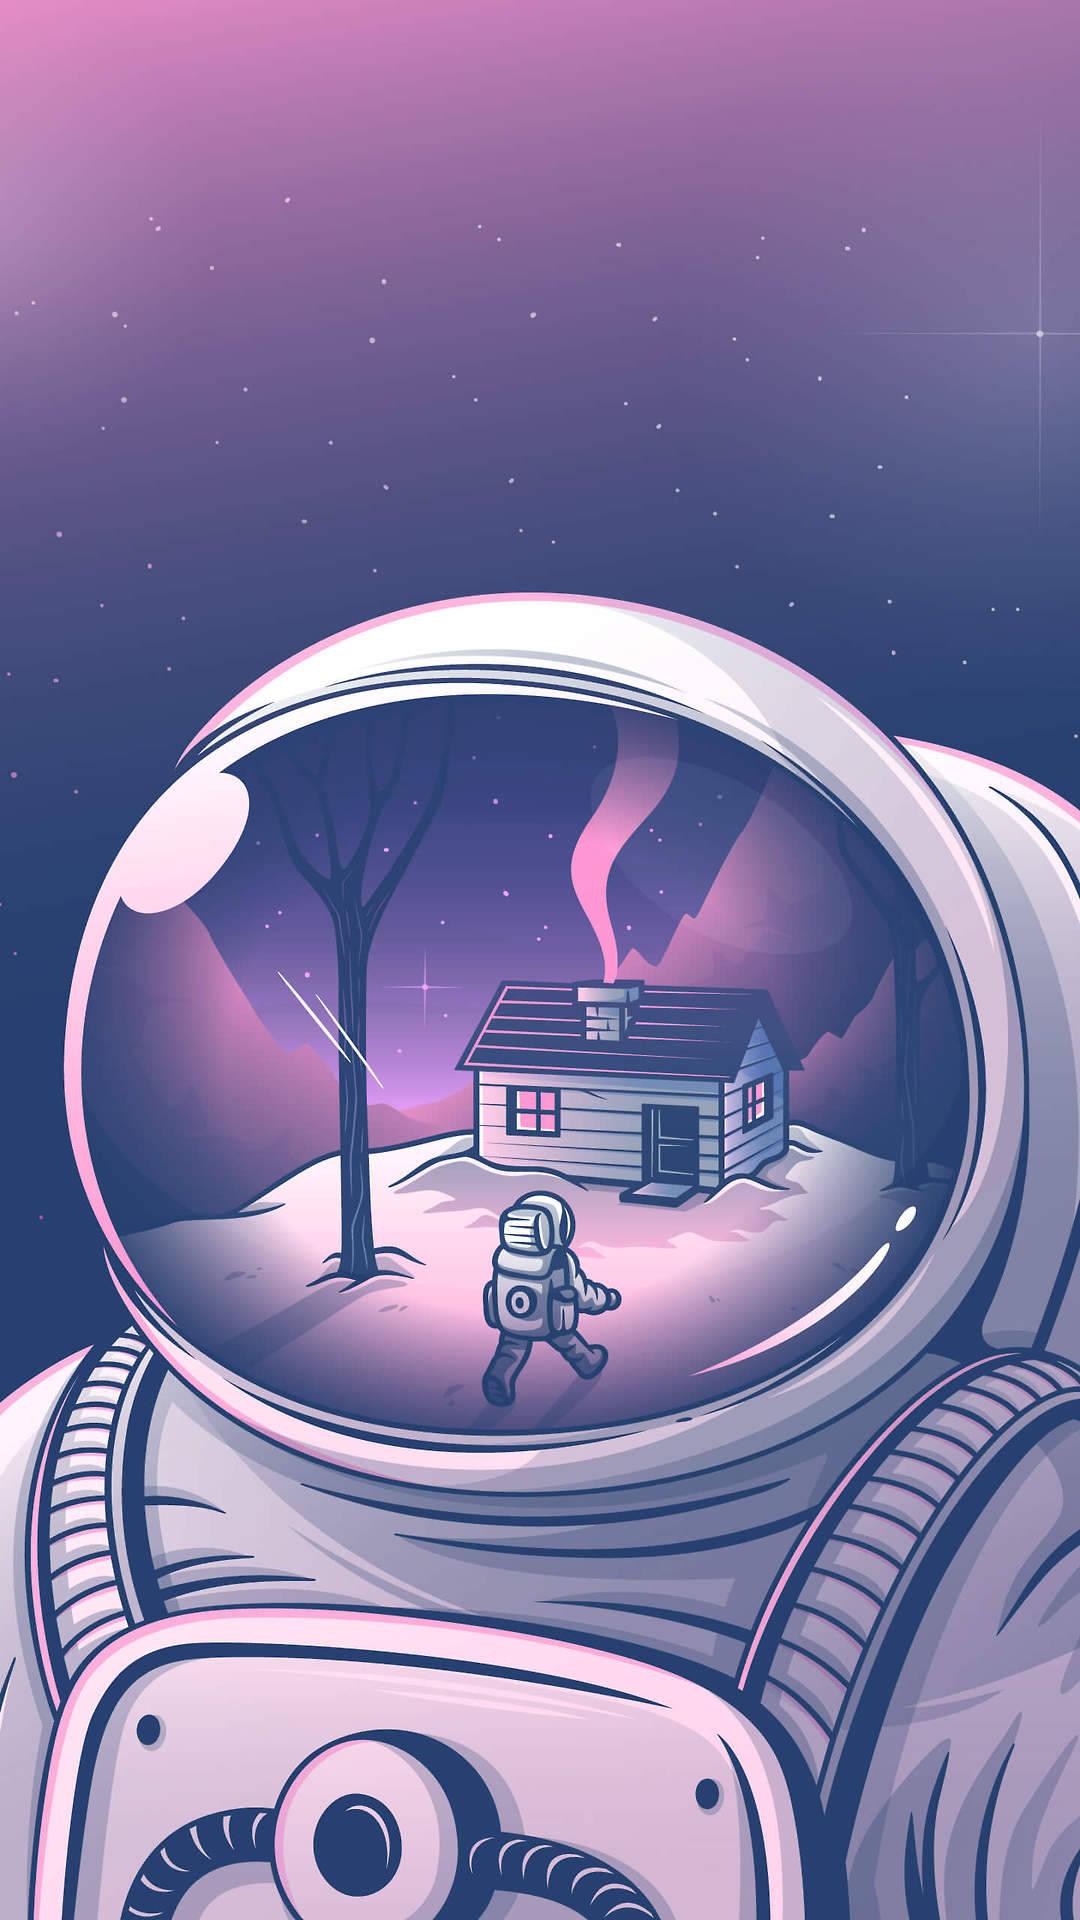 Wallpaper Celular Tumblr Astronauta